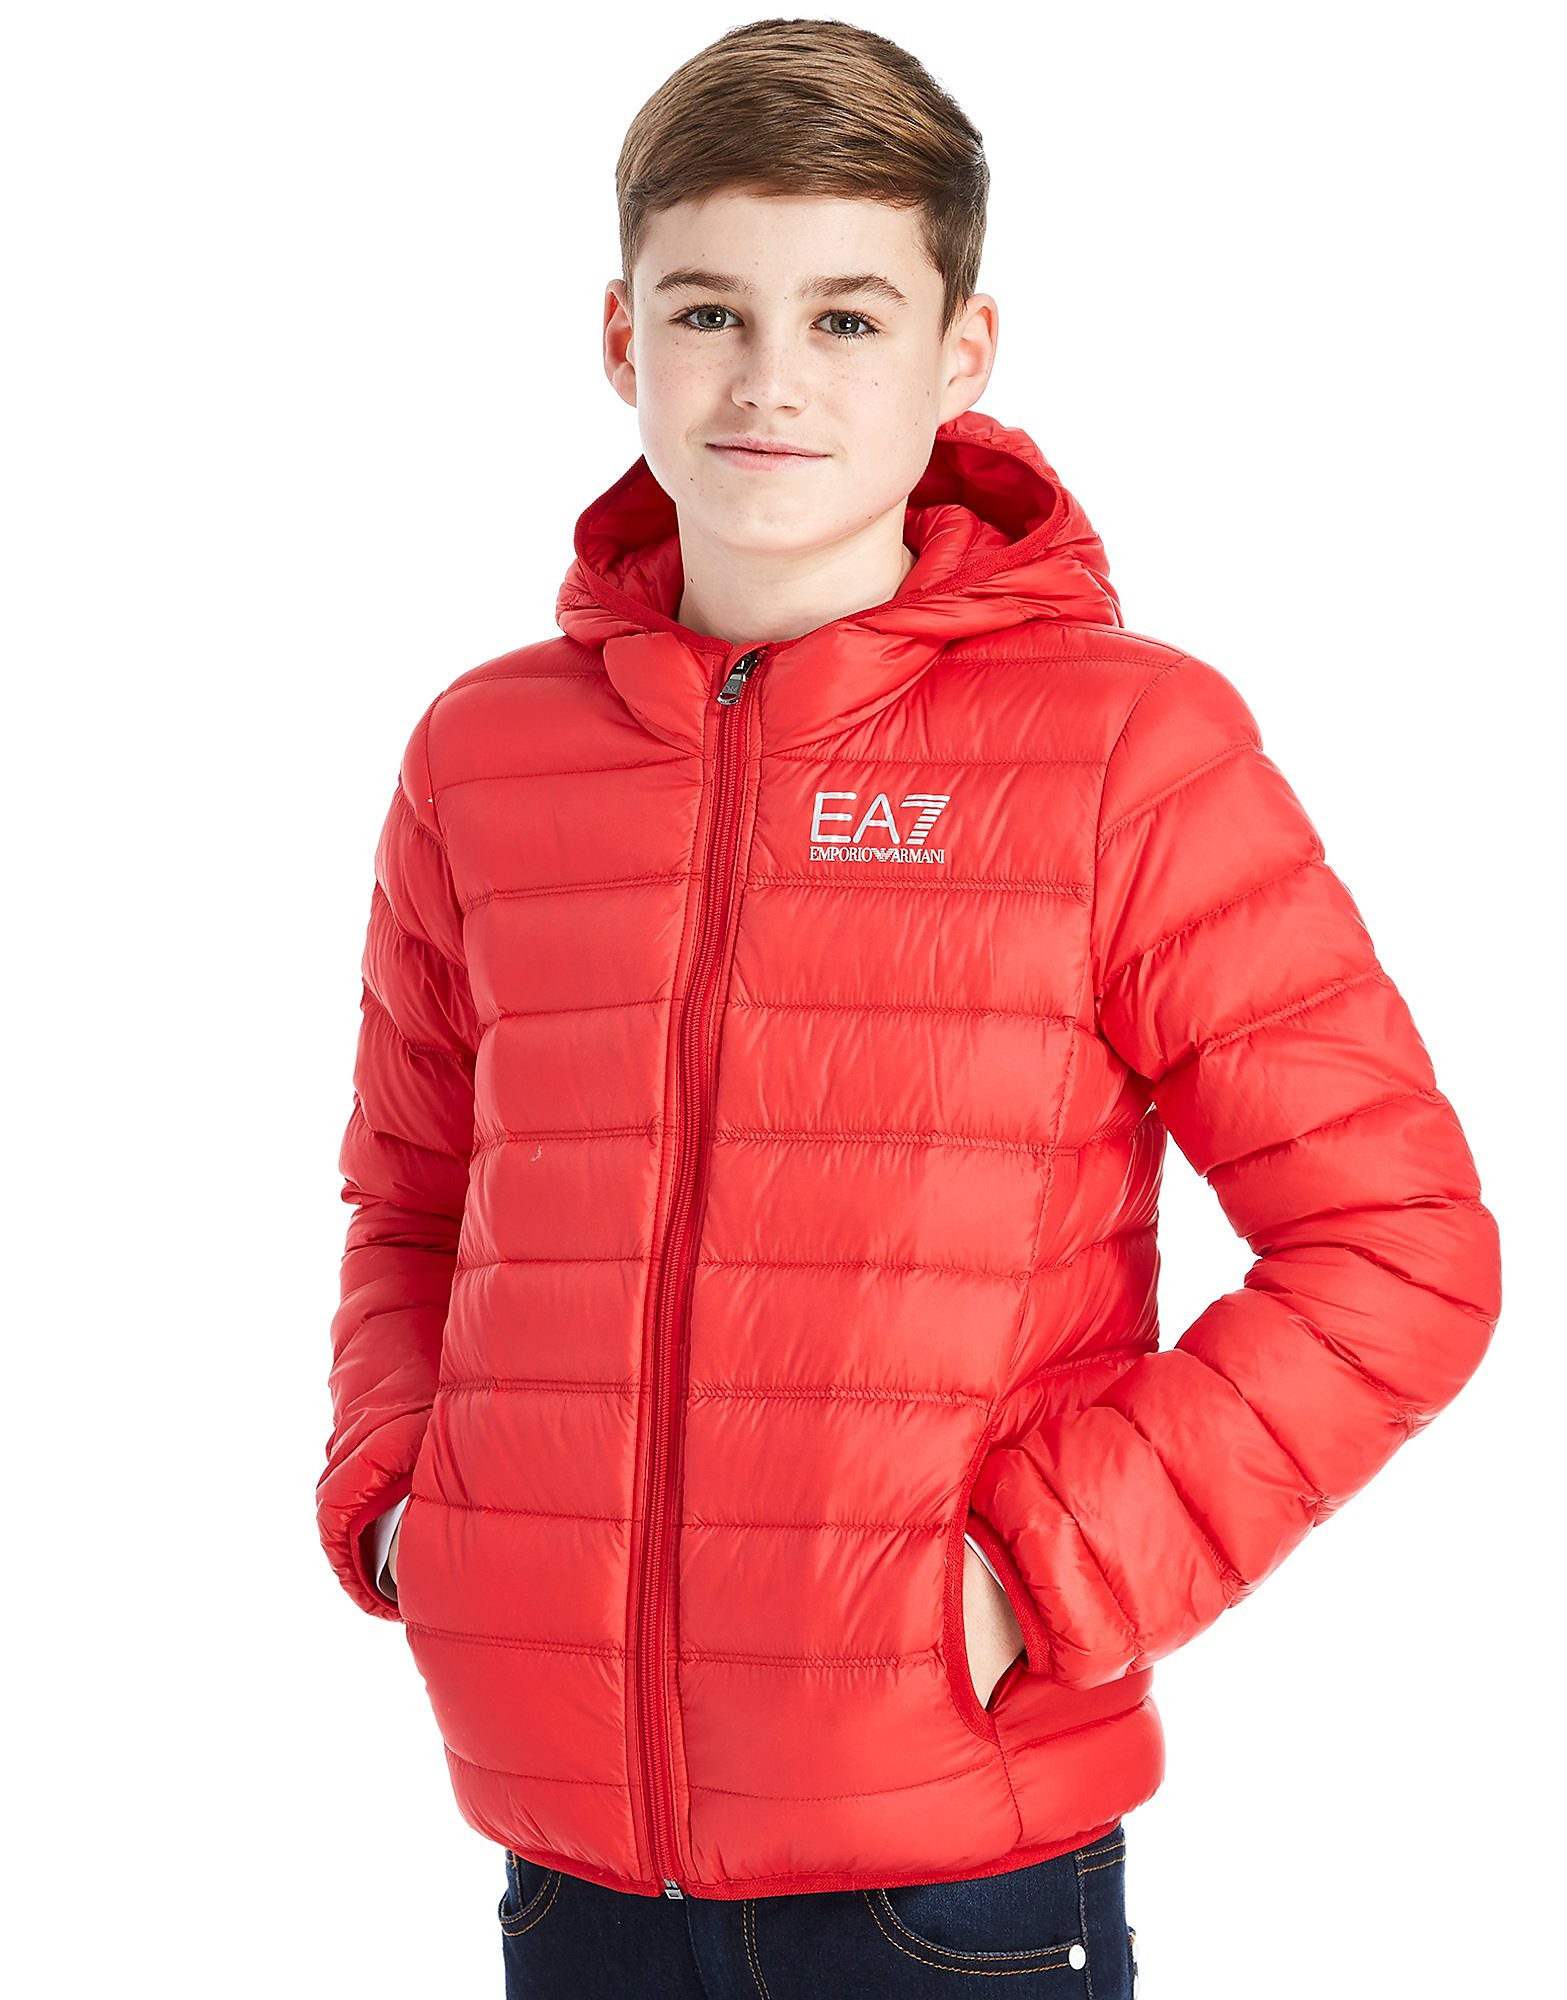 Emporio Armani EA7 Core Down Jacket Junior - Red, Red